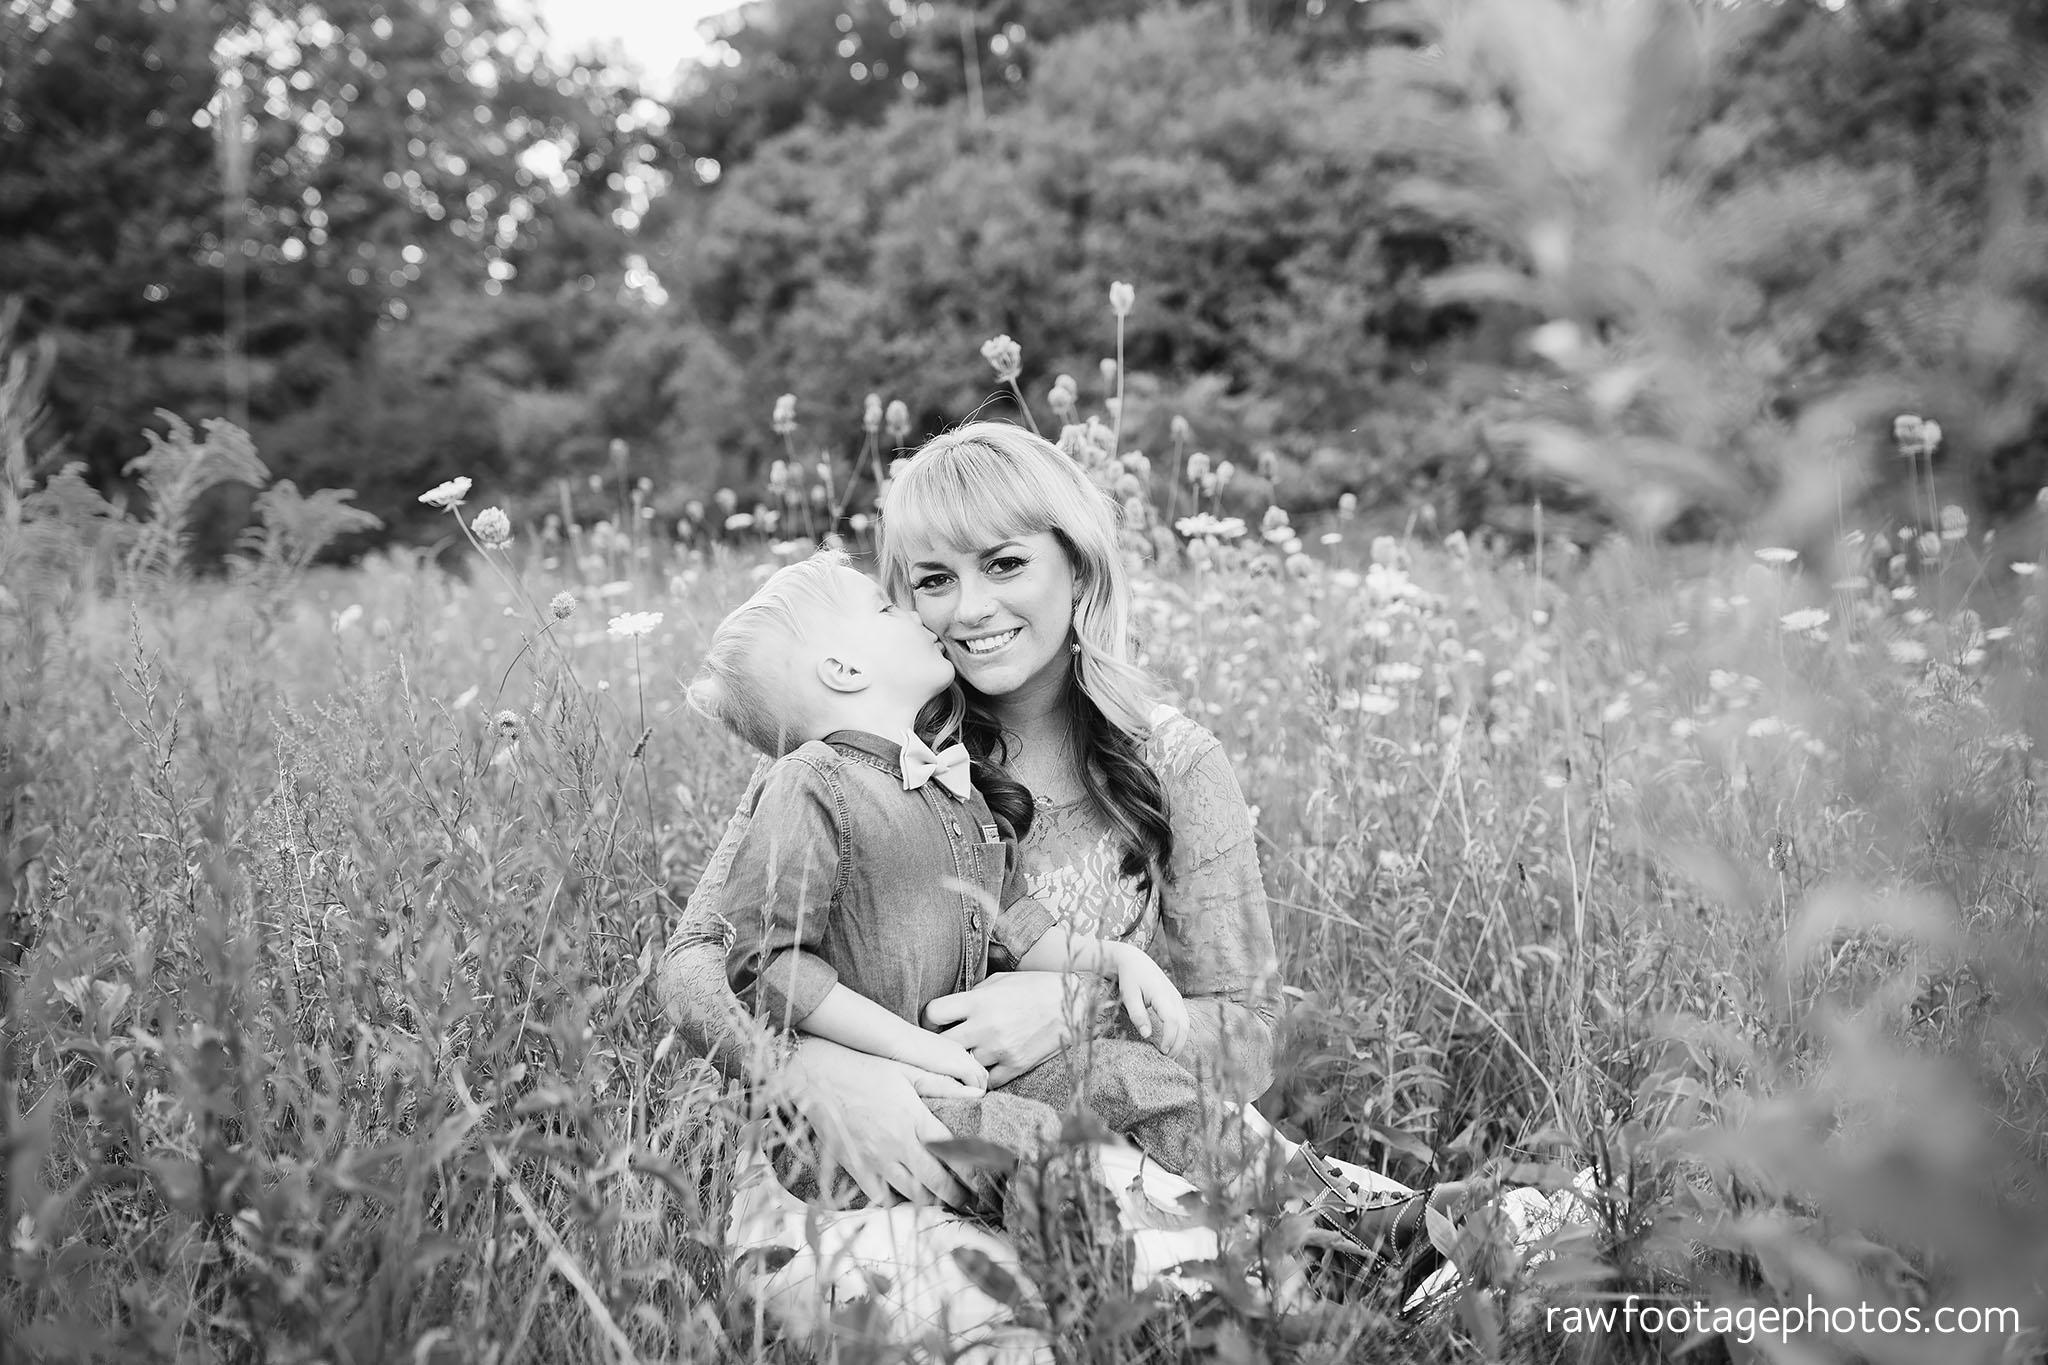 London_Ontario_Photographer-family_photography-pet_photography-lifestyle_photography005.jpg